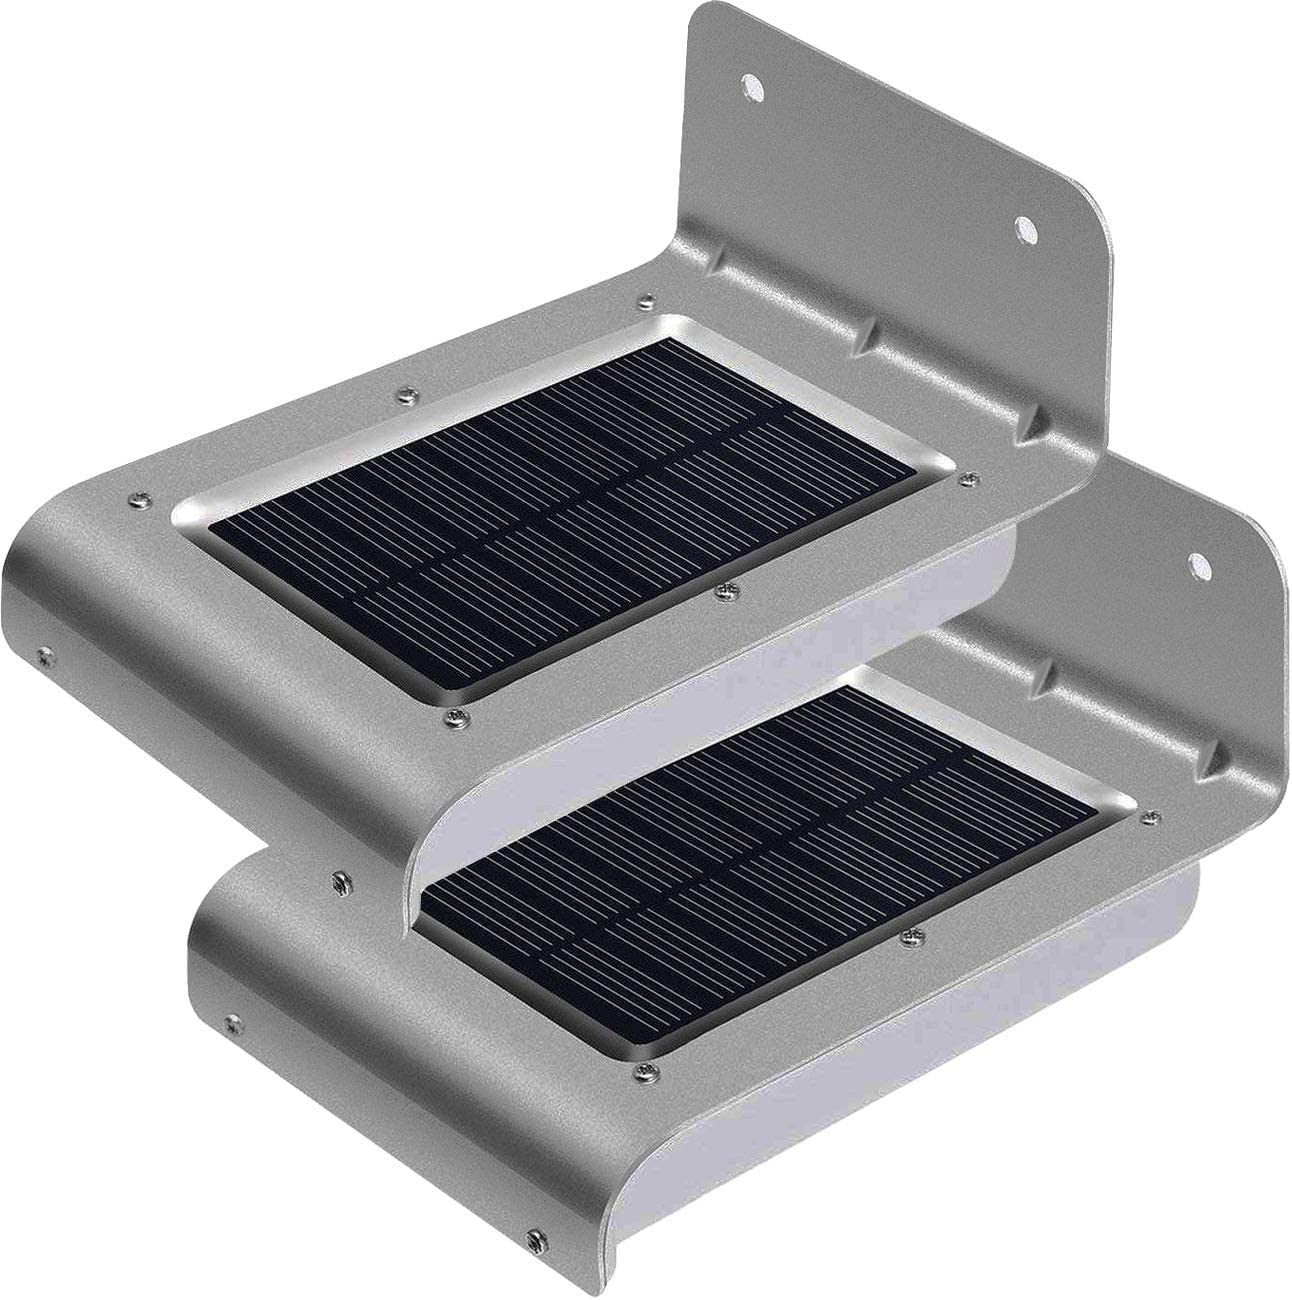 2pcs Solar Lights LED Outdoor Solar Motion Sensor Lights for Garden Patio Path Wall Mount Gutter Fence Light